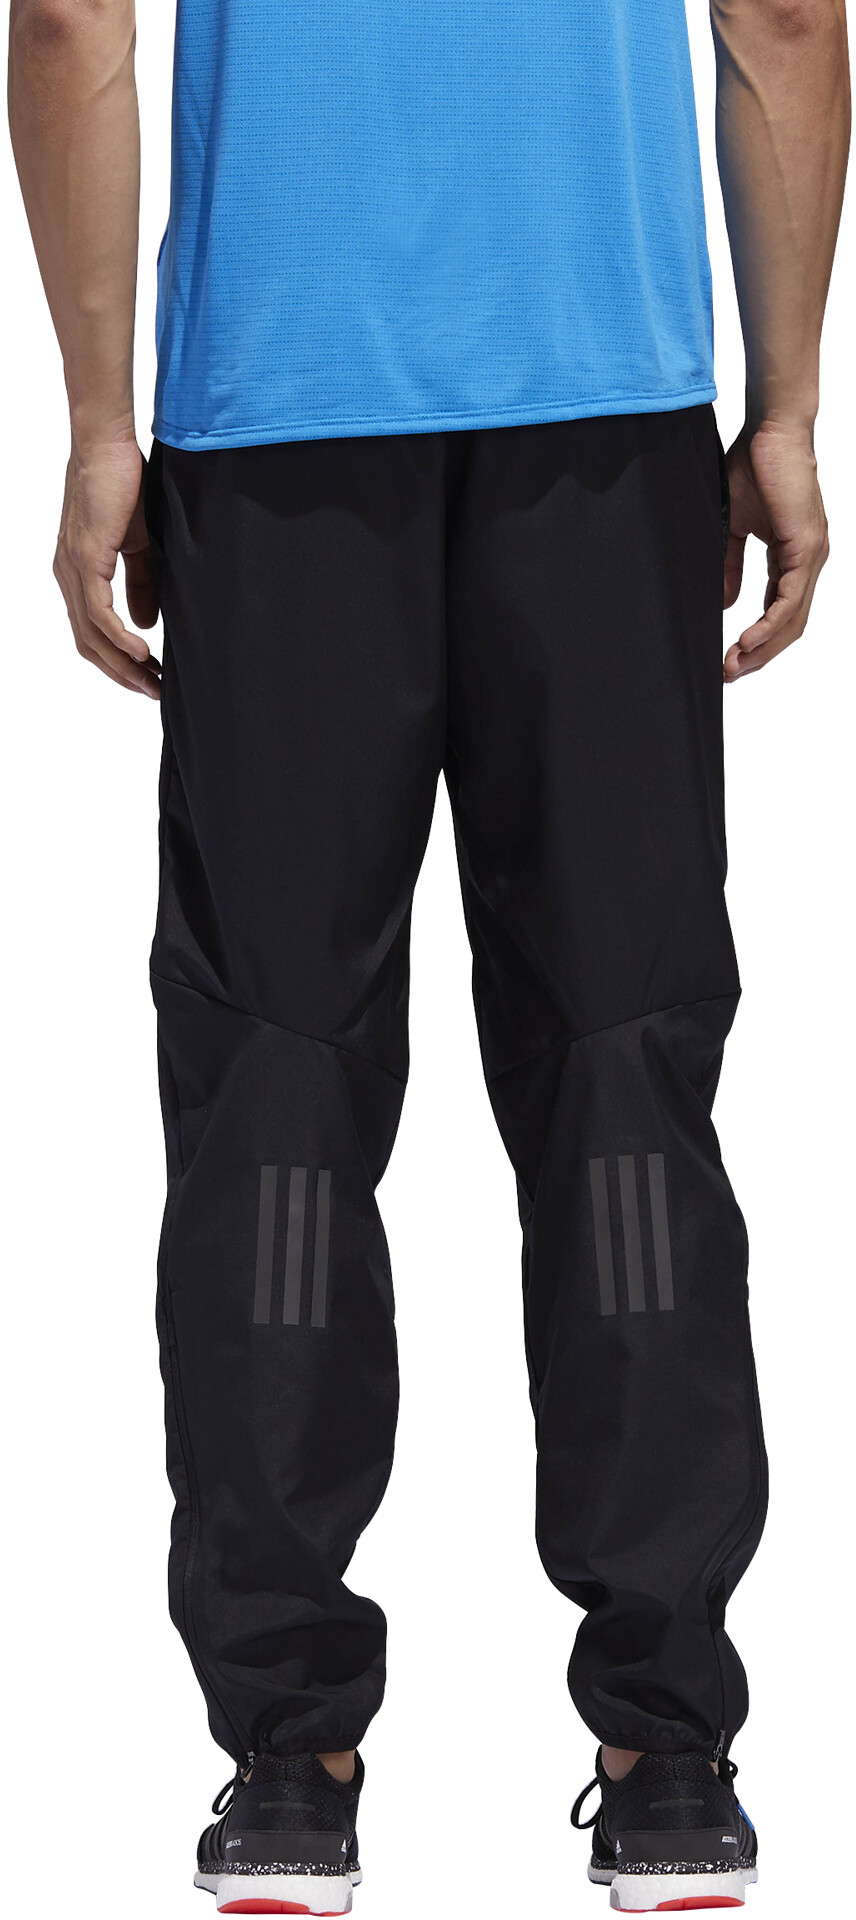 buy online 2cceb 9735d adidas Response Astro - Pantalon running Homme - noir